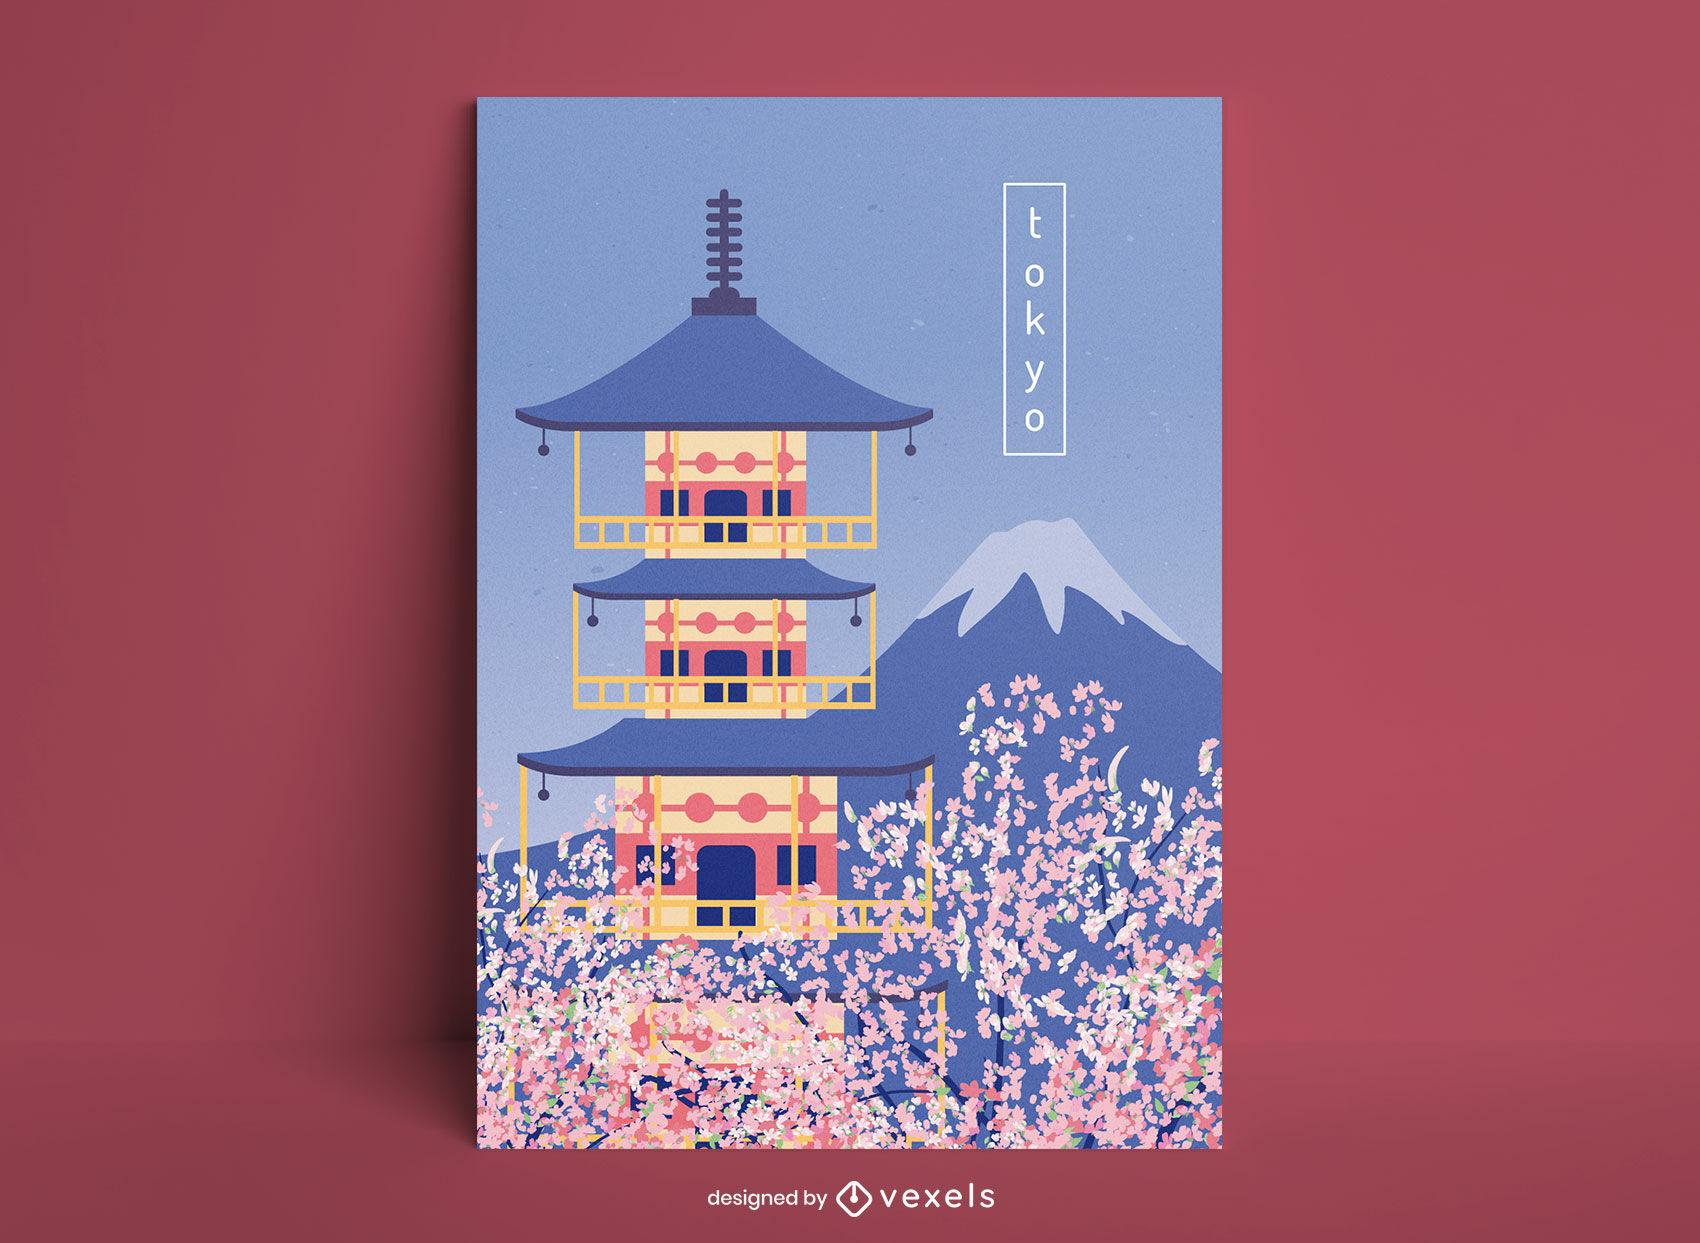 Dise?o de cartel de viaje de templo japon?s de Tokio